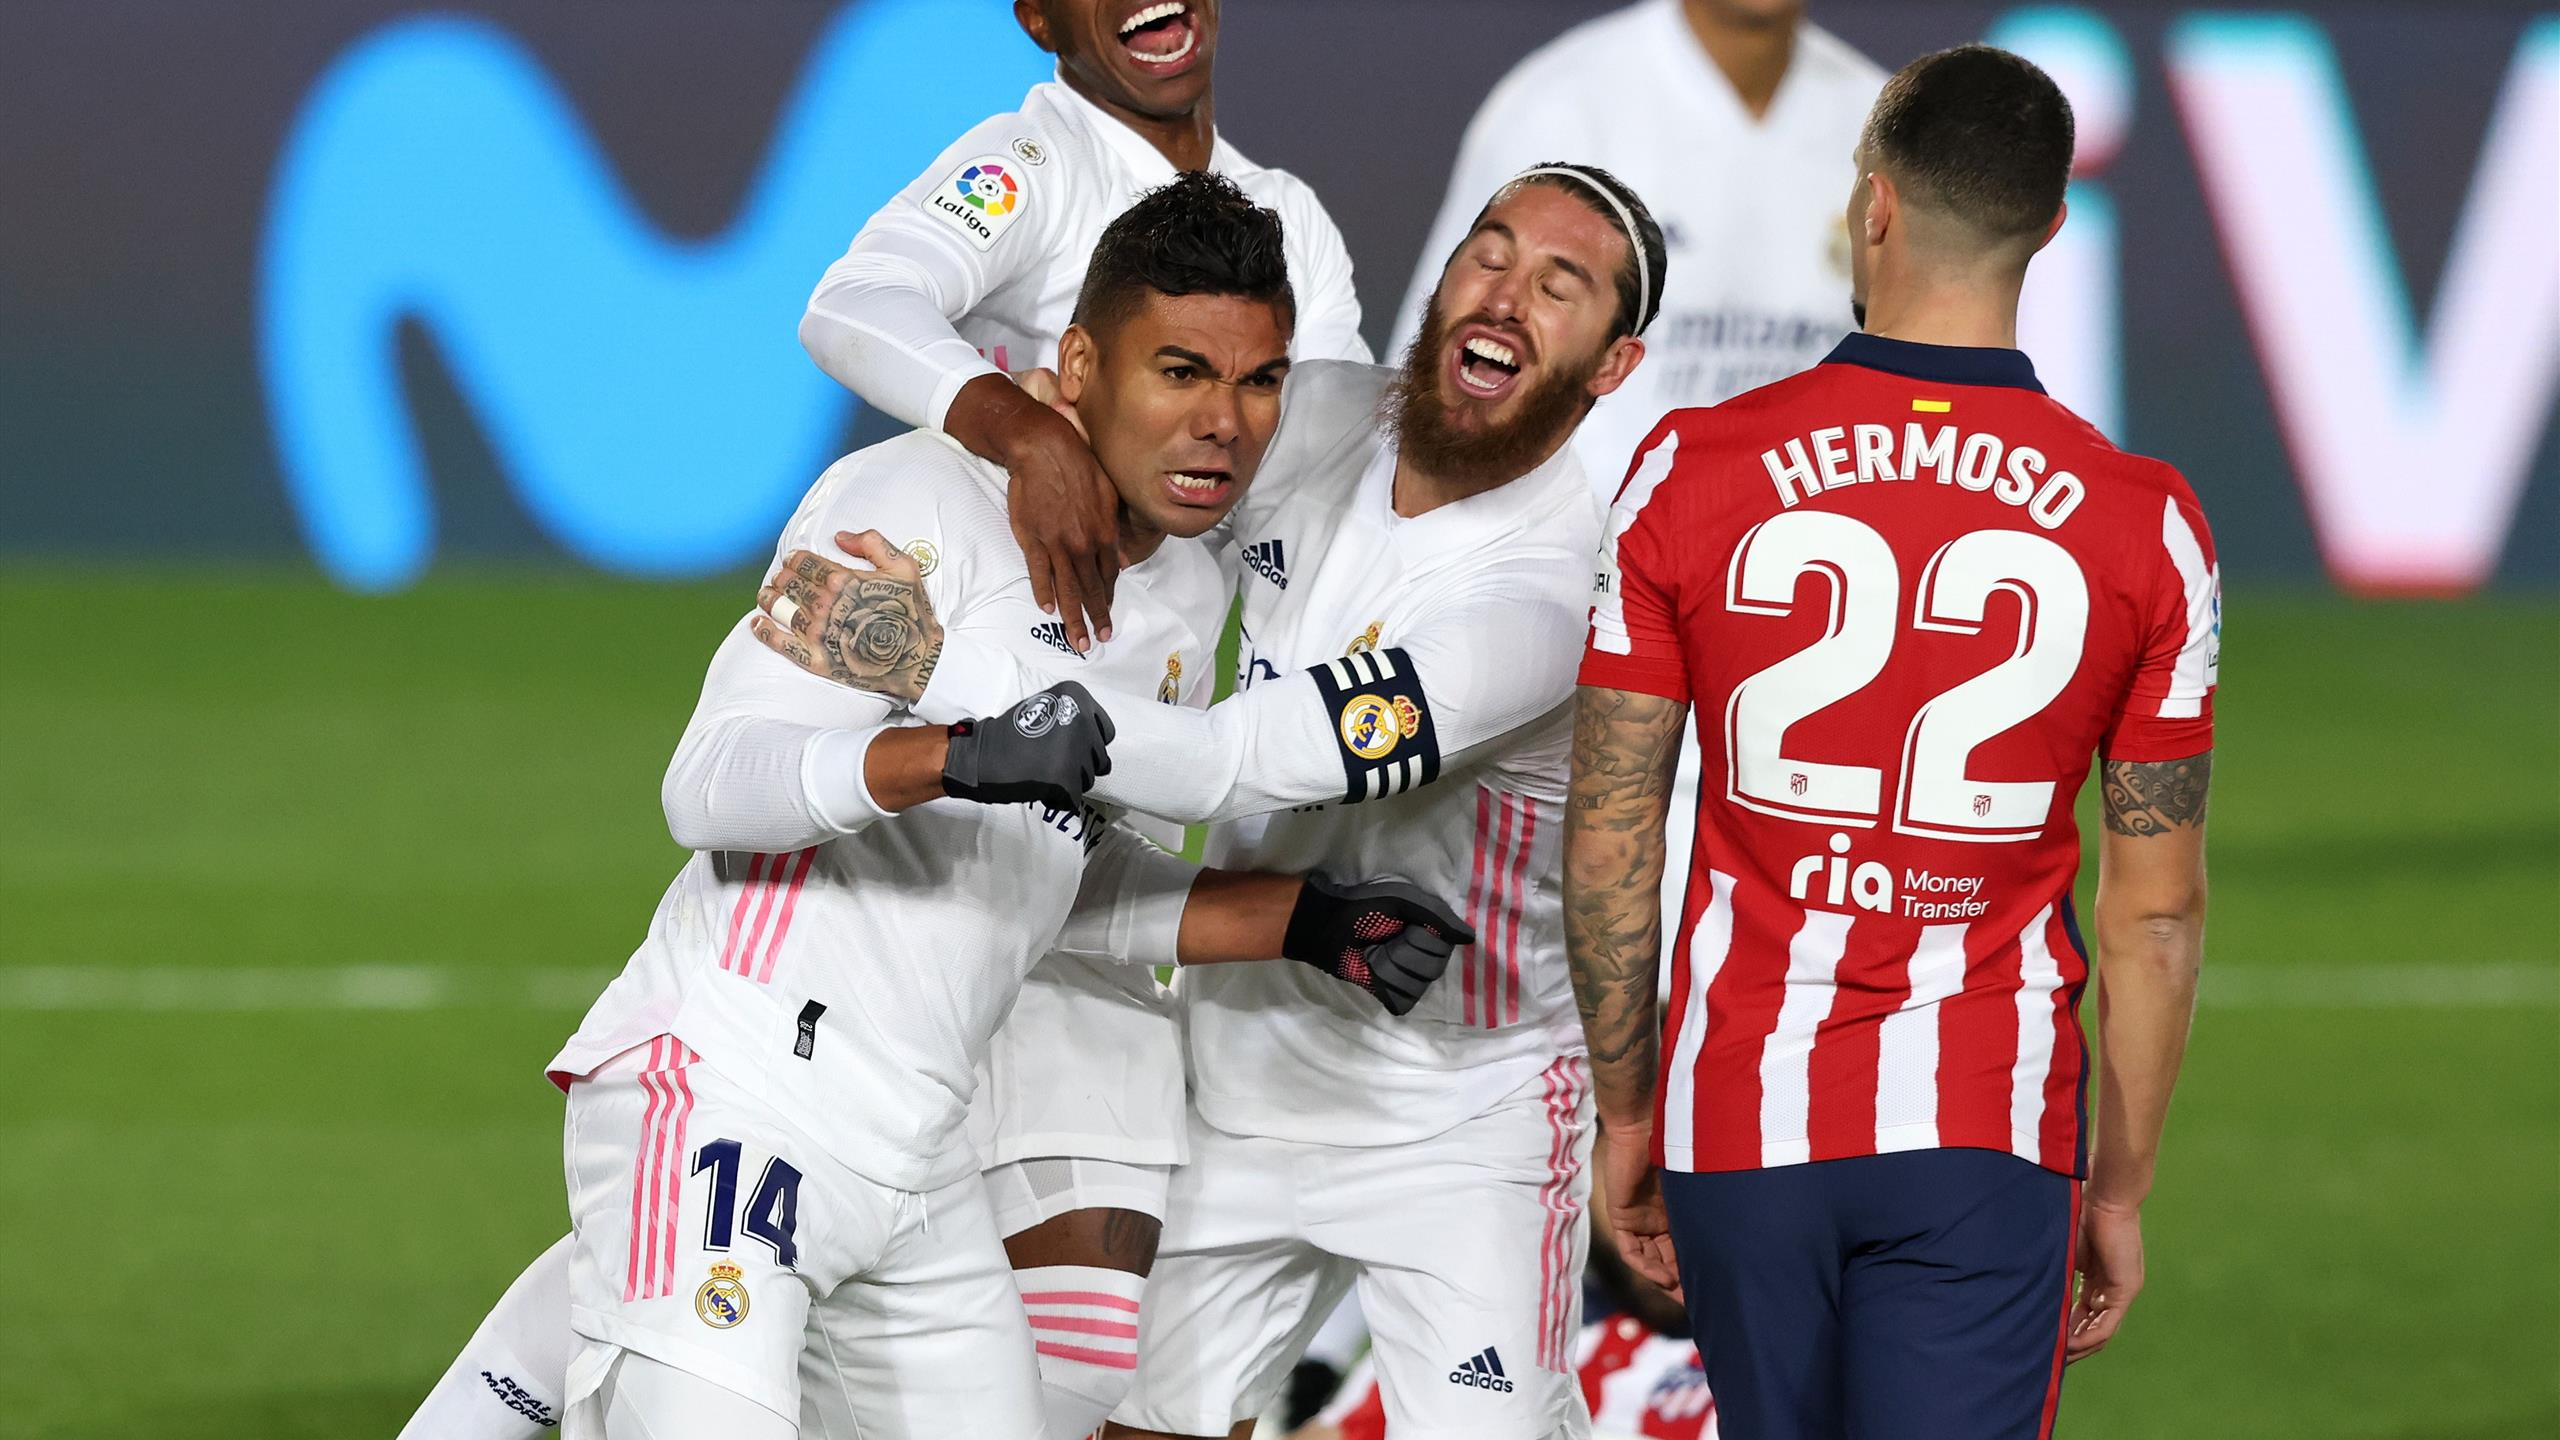 Liga, Real Madrid-Atletico Madrid 2-0: Casemiro e autogol di Oblak ...